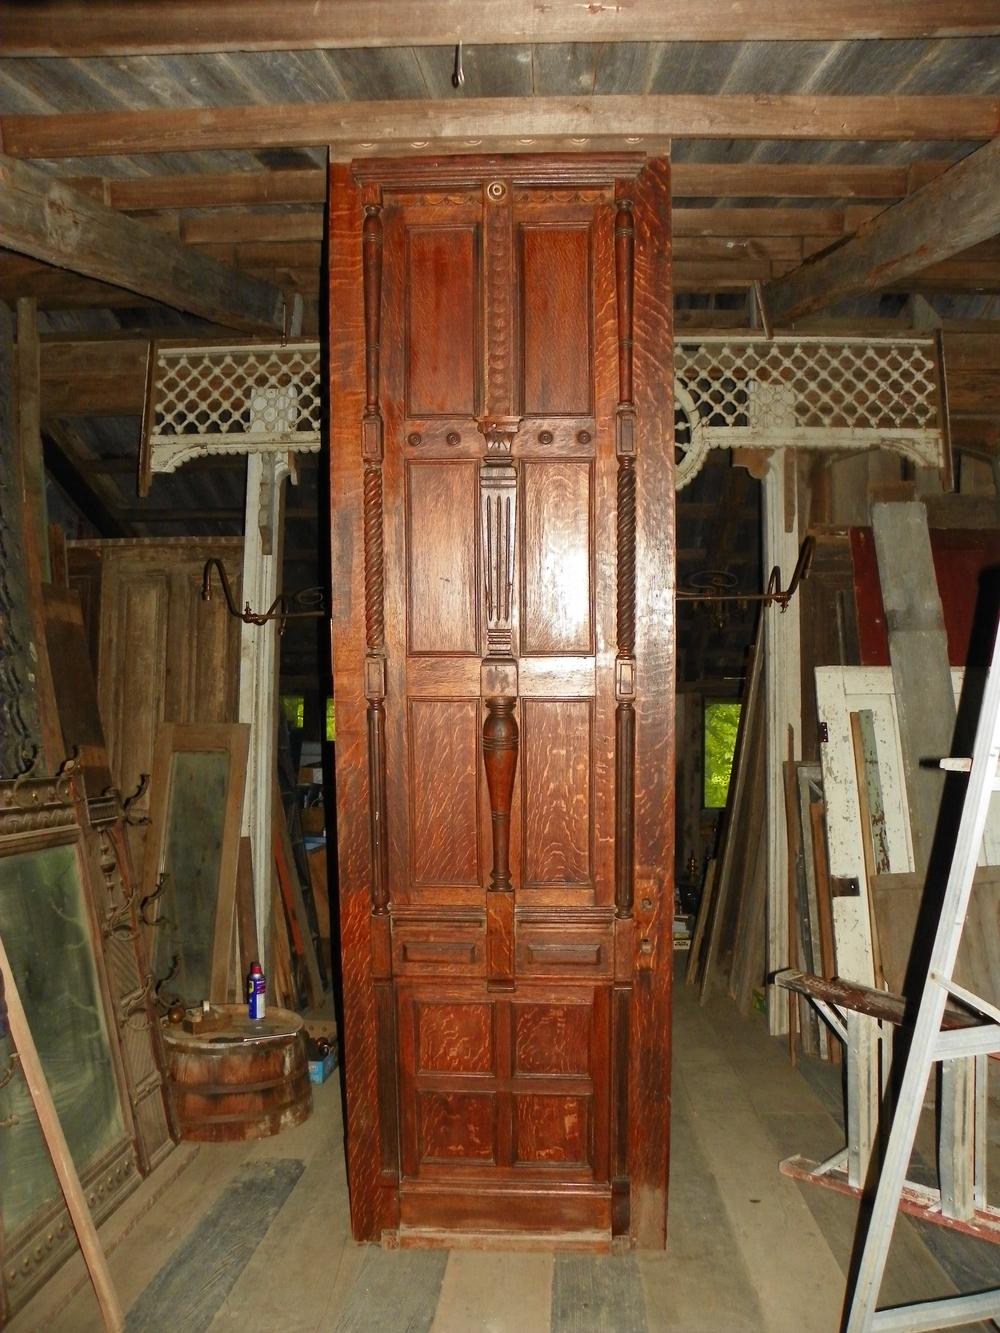 Magnificent Quarter Sawn Oak door with all brass original hardware. 10 feet tall and 4 feet wide. What an Entrance Door!!!